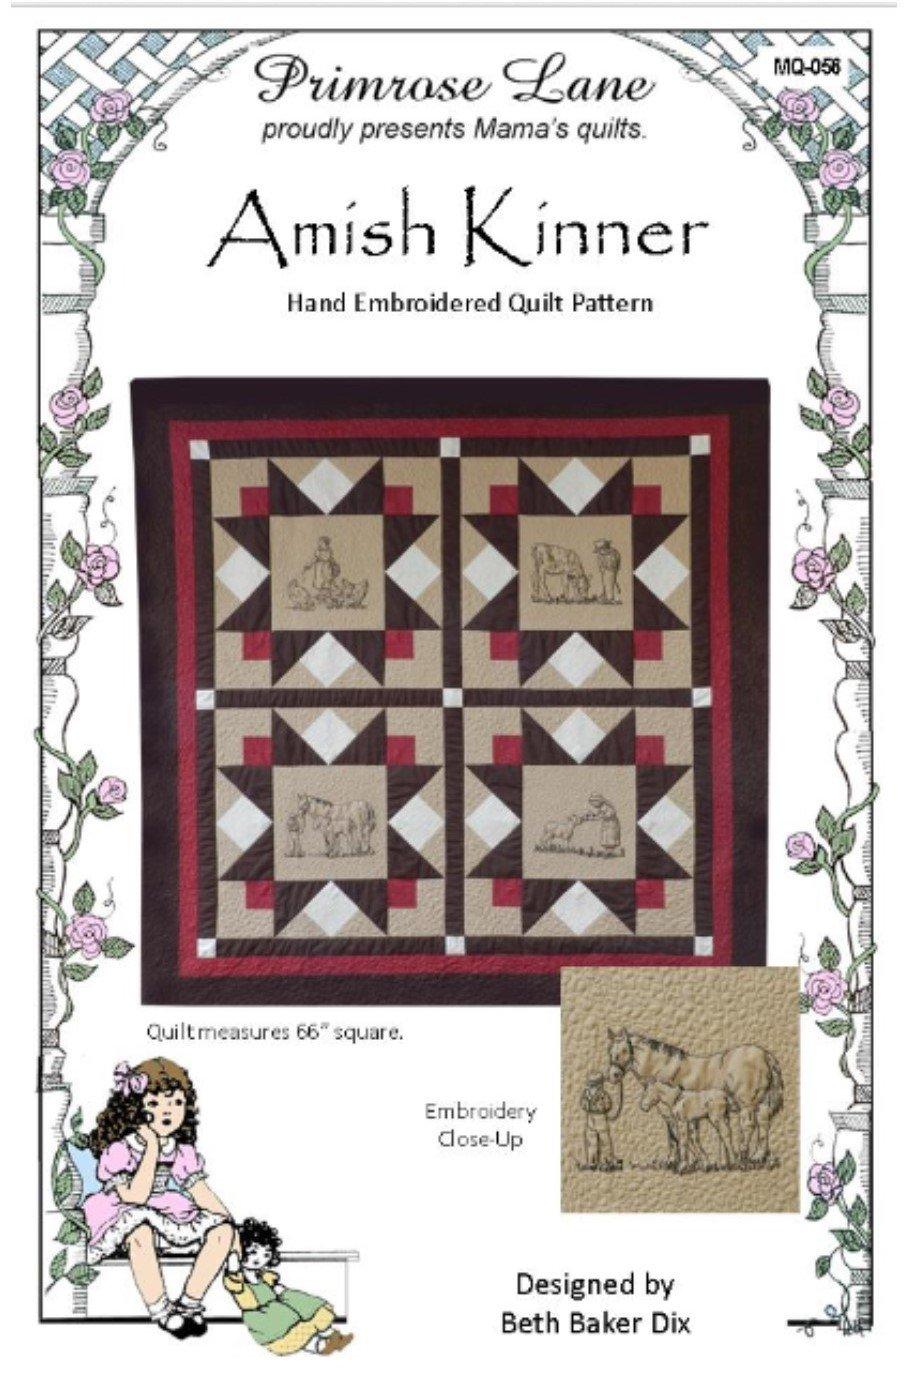 Amish Kinner